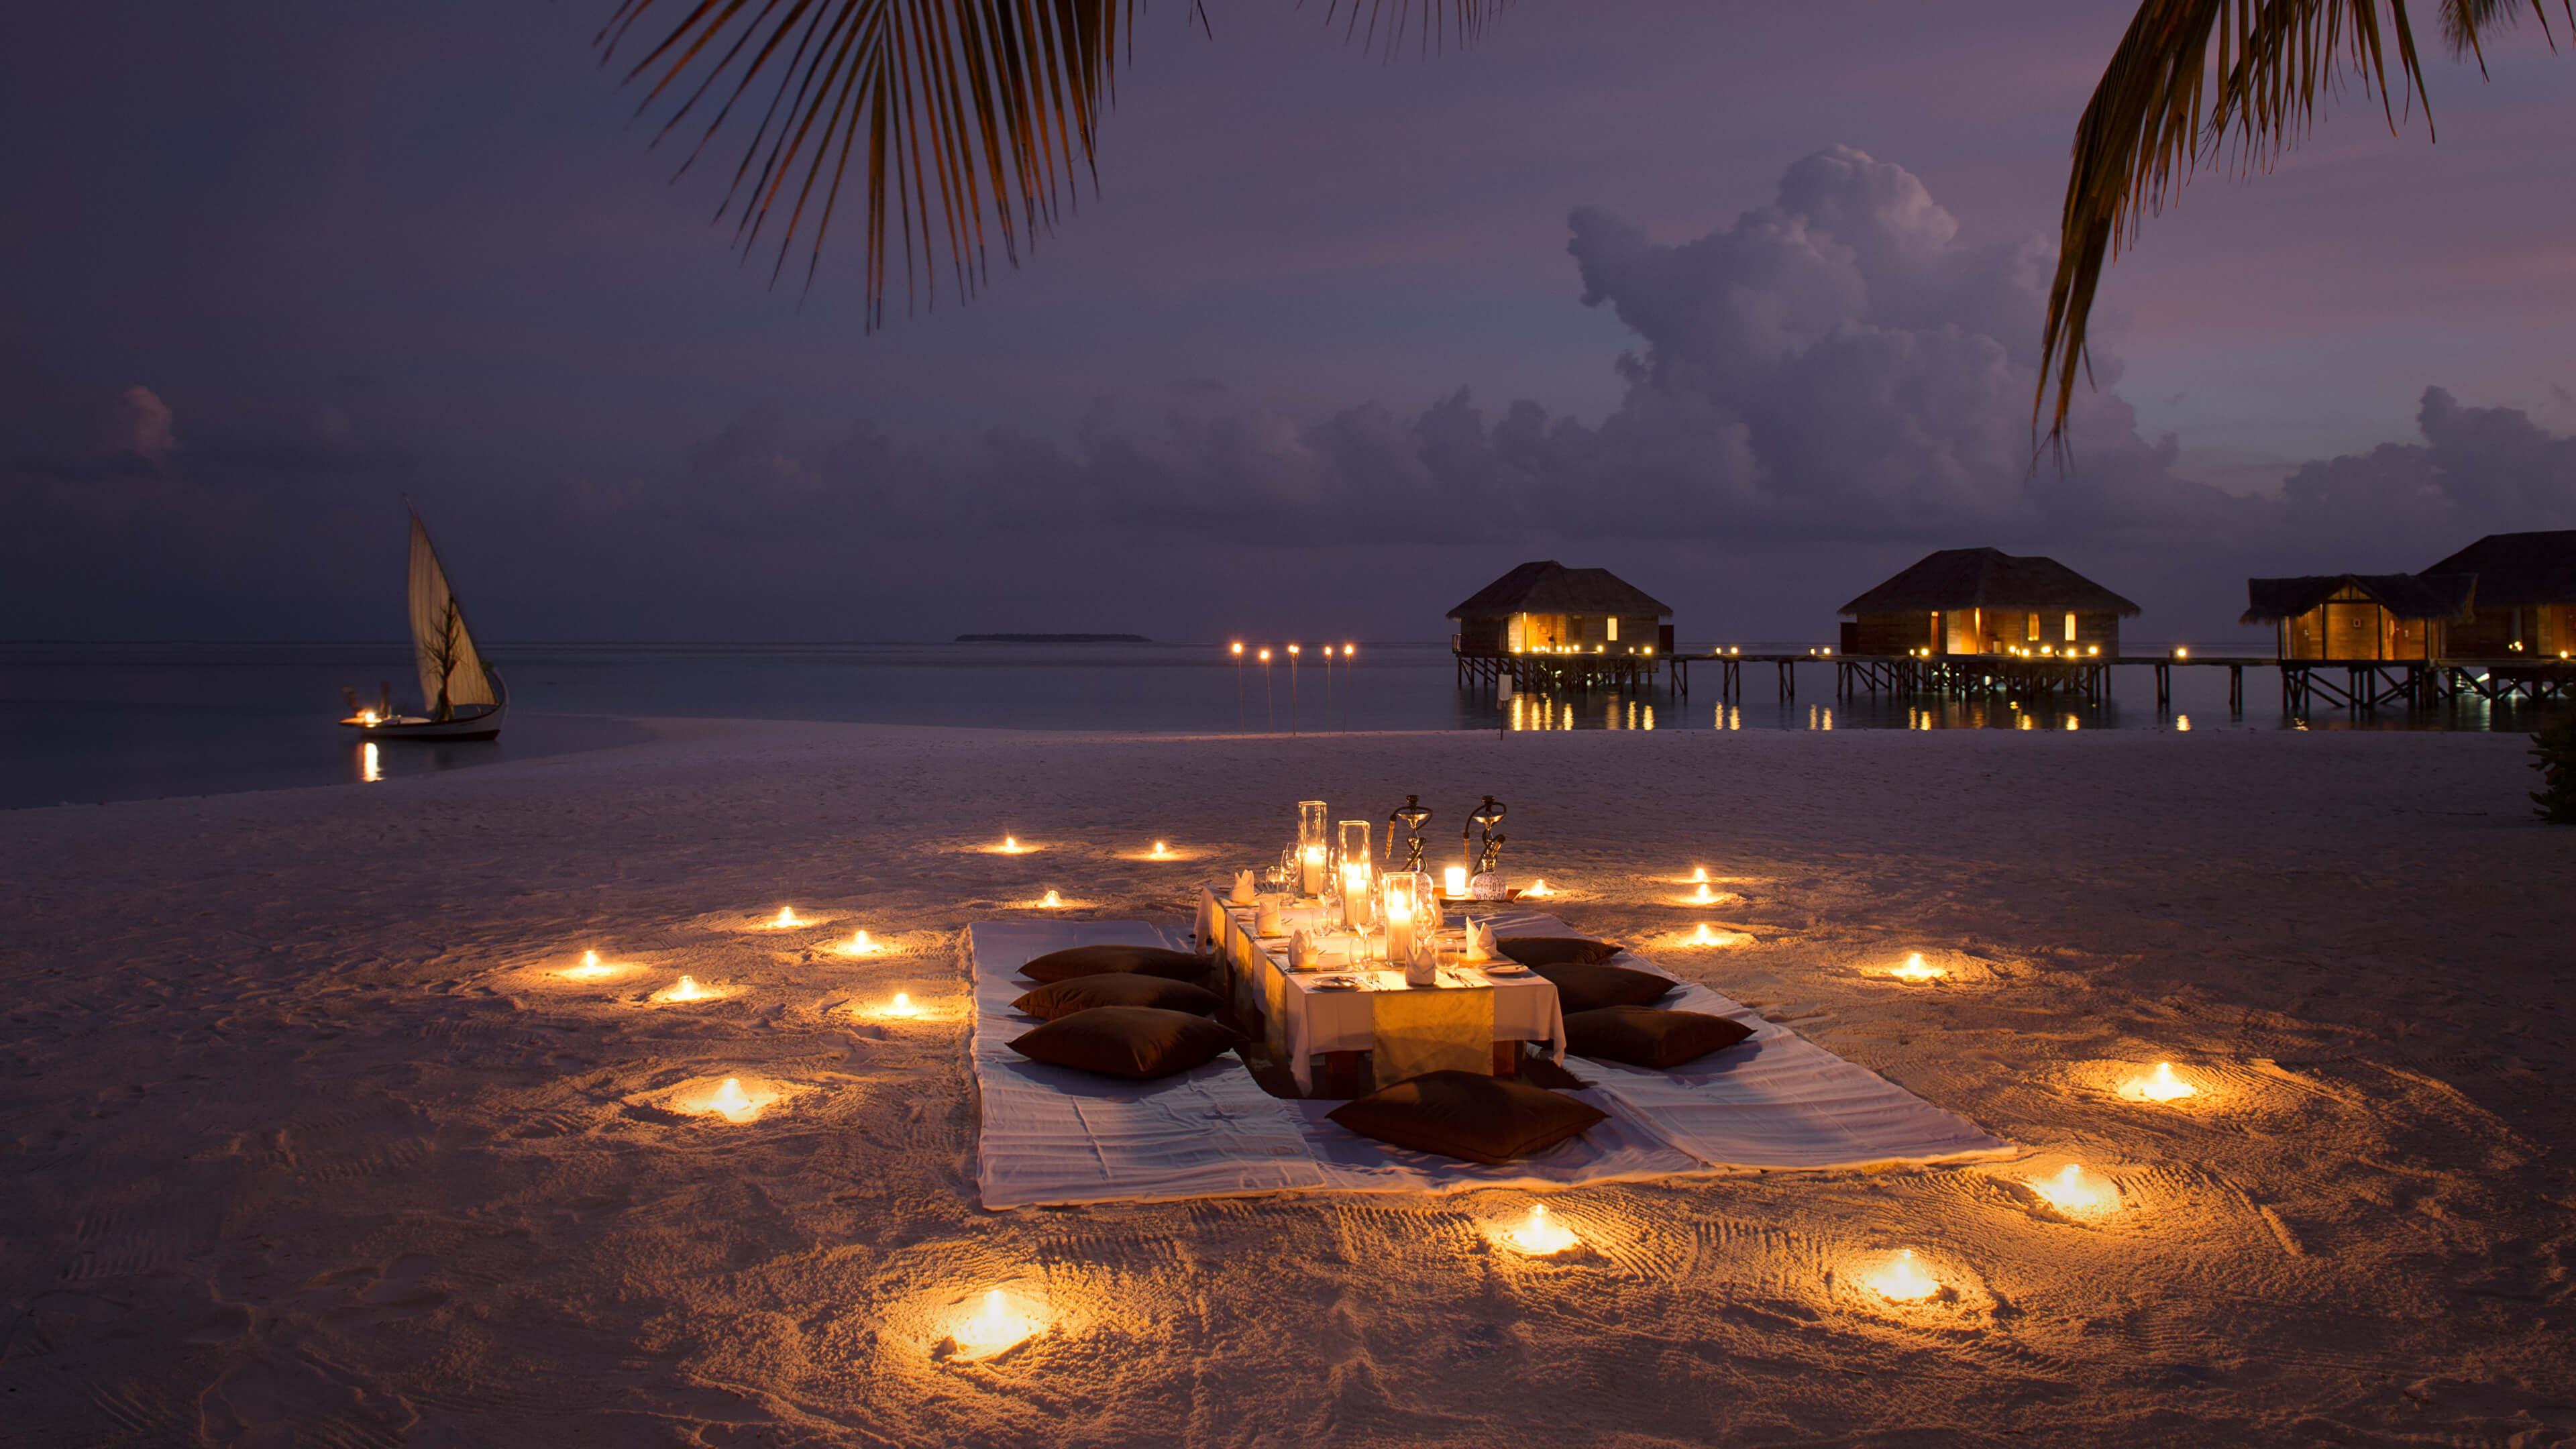 Красивые картинки и обои вечера, затенков - подборка (28 фото) 24